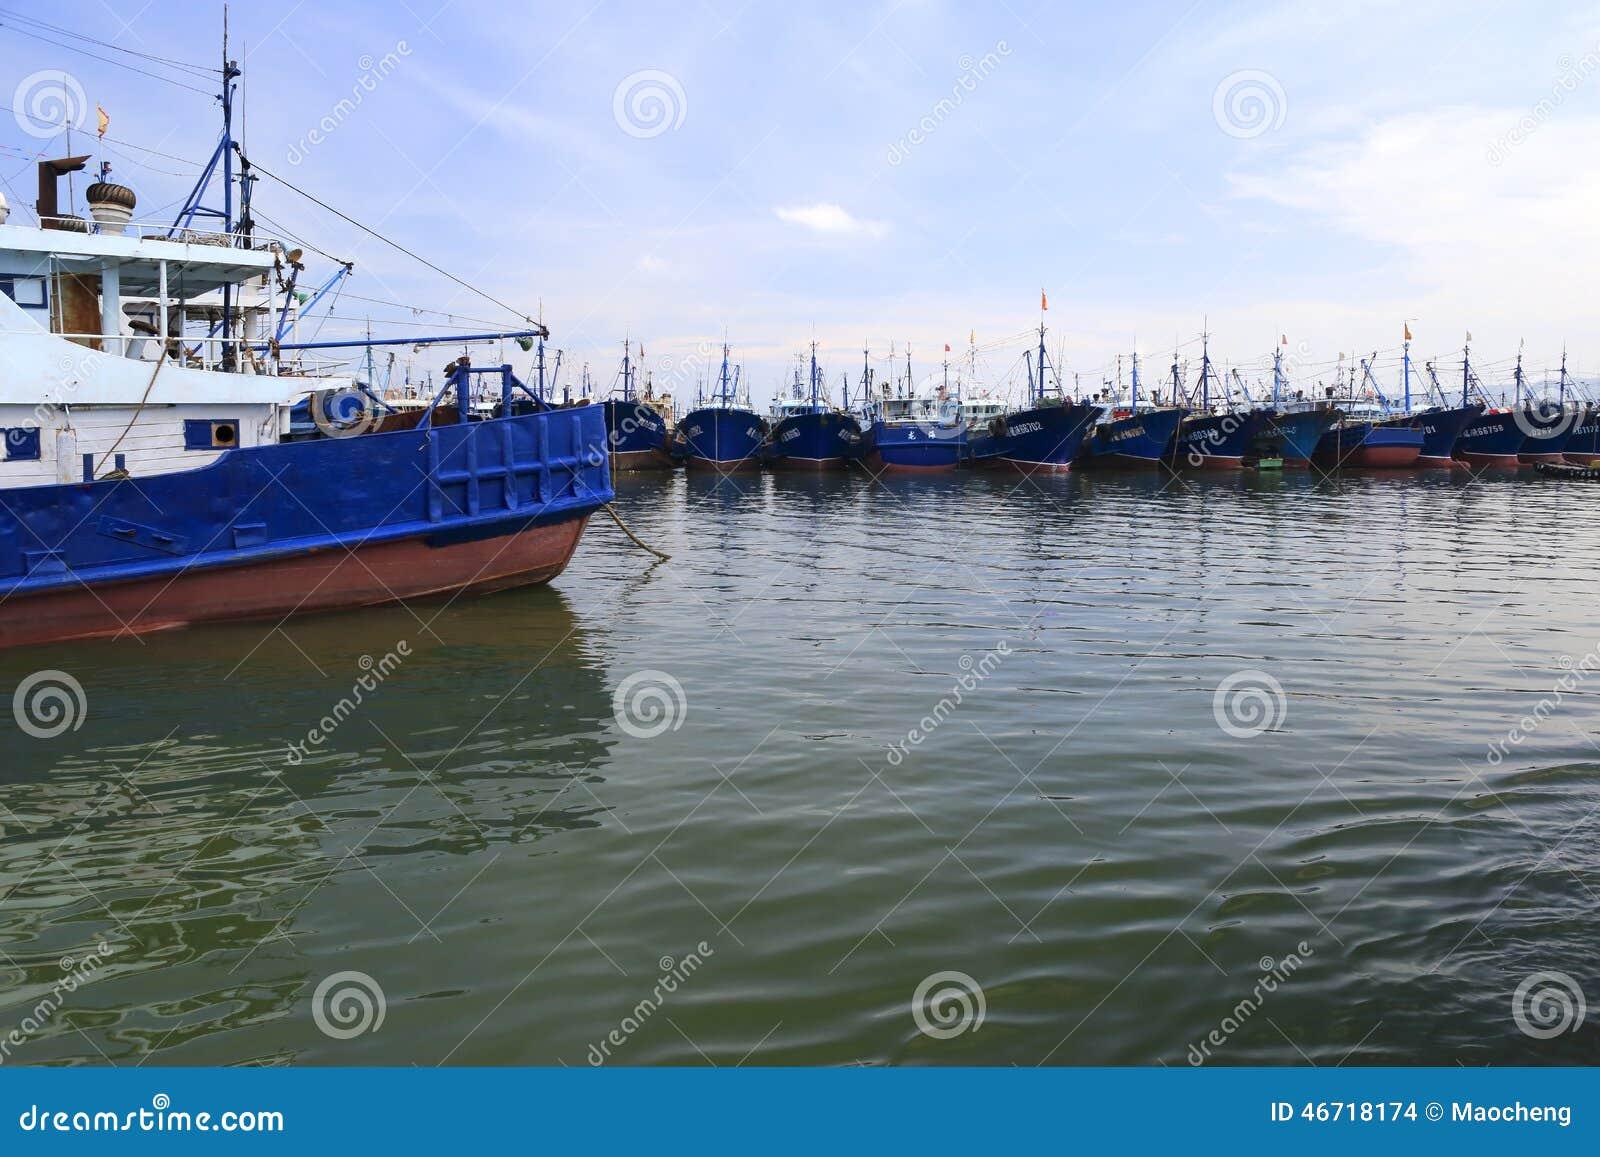 Fishing boats of wuyu island editorial stock image image for City island fishing